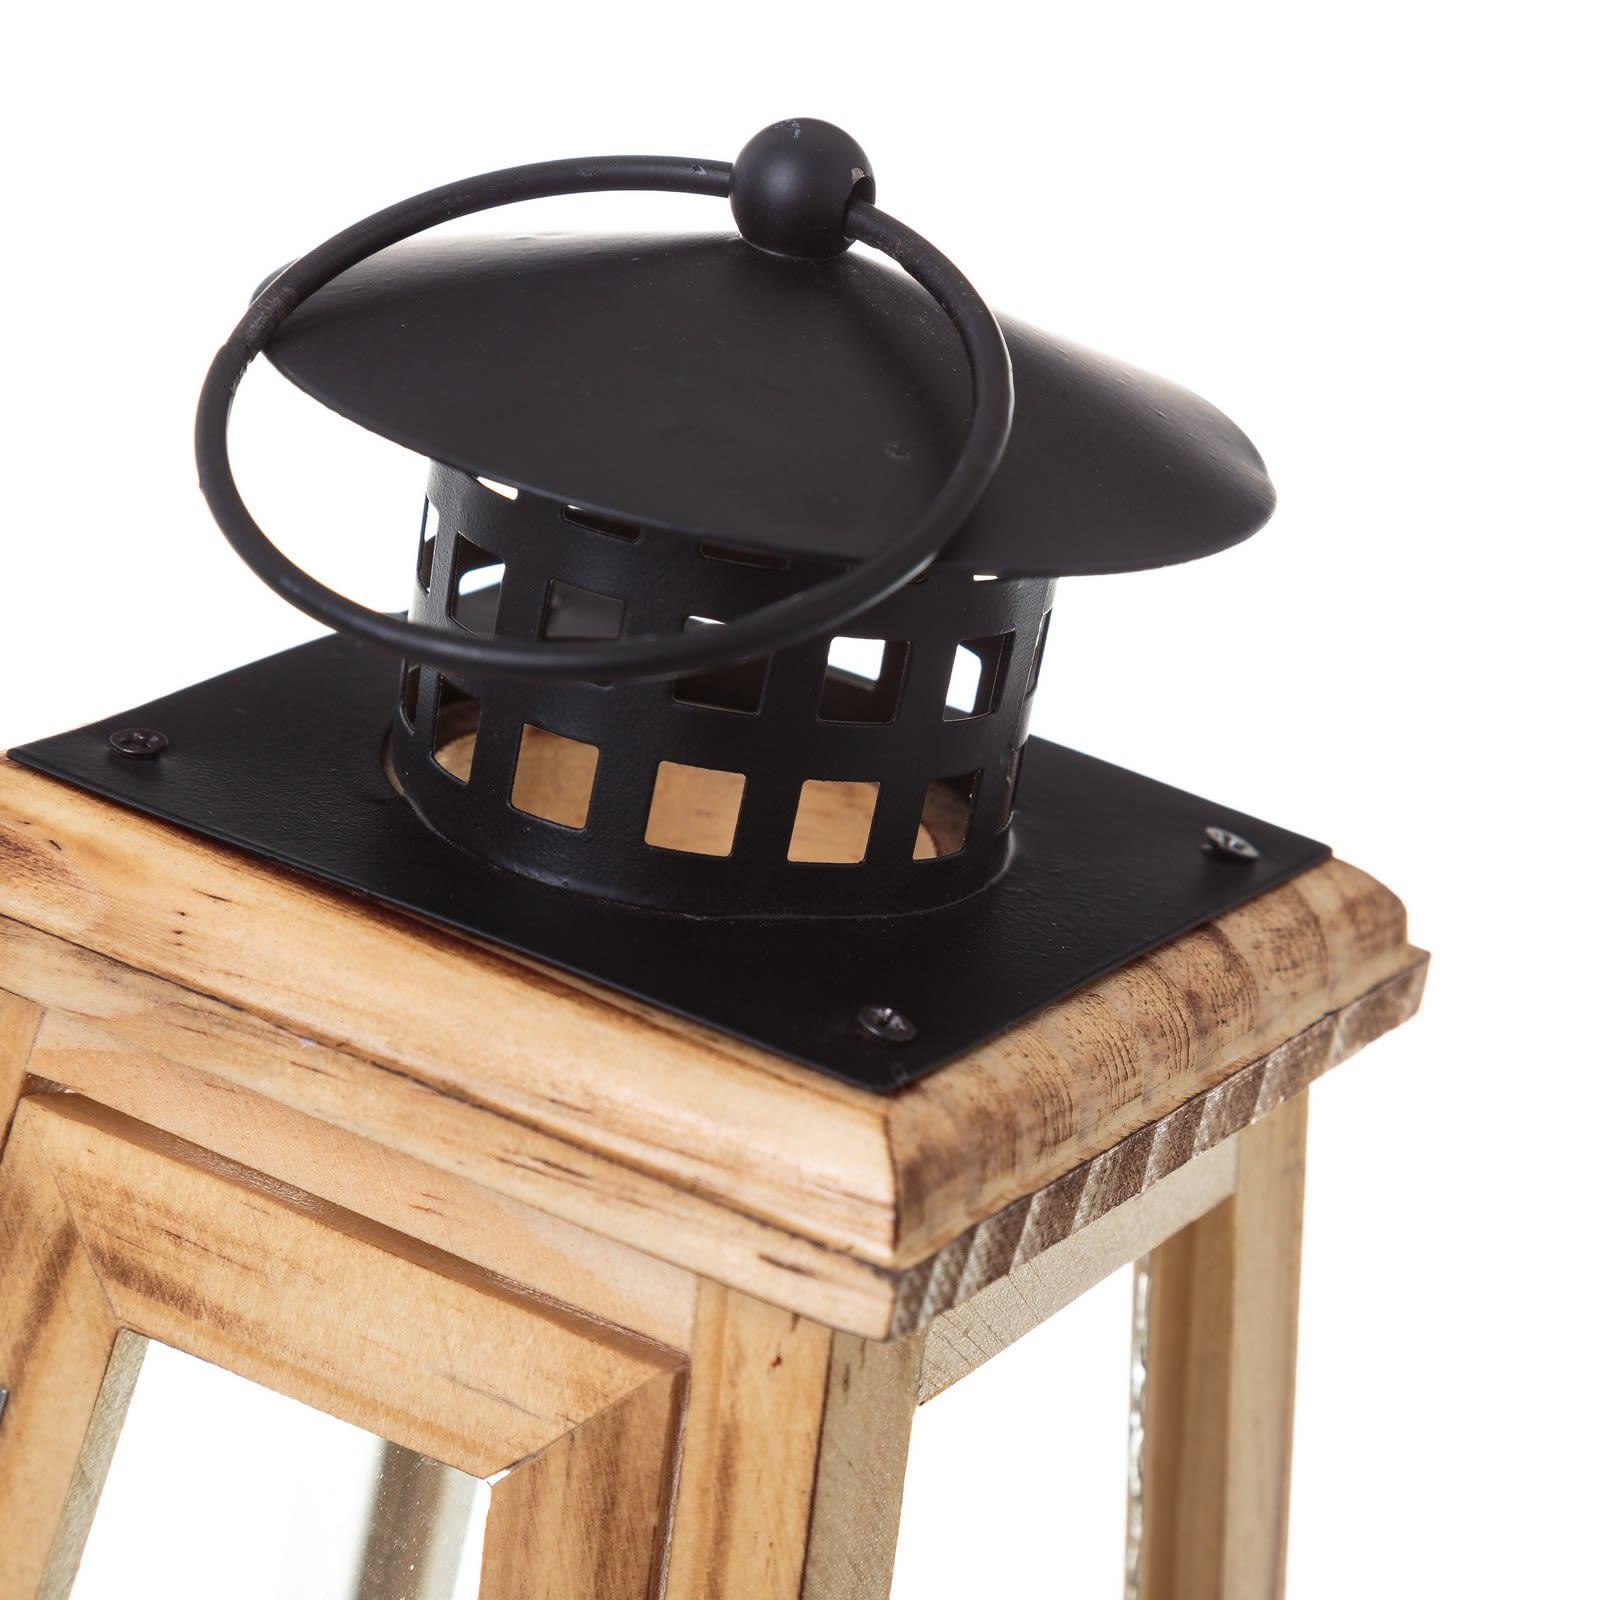 29996-farol-portavelas-madera-25-cm-1.jpg